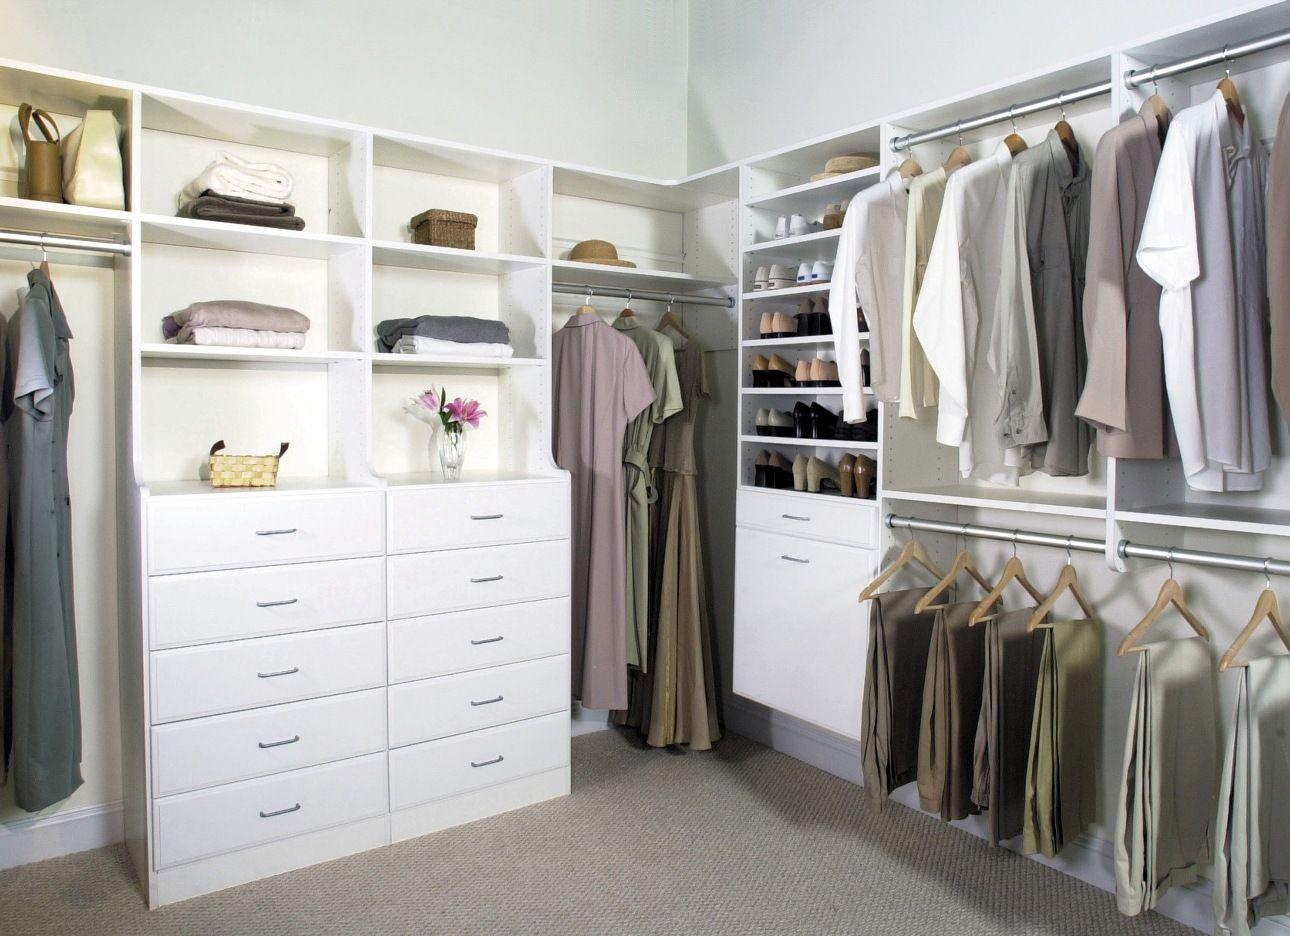 20 Stunning Farmhouse Storage Closets Design Examples Enjoy Closet Bedroom Walk In Closet Design Closet Layout